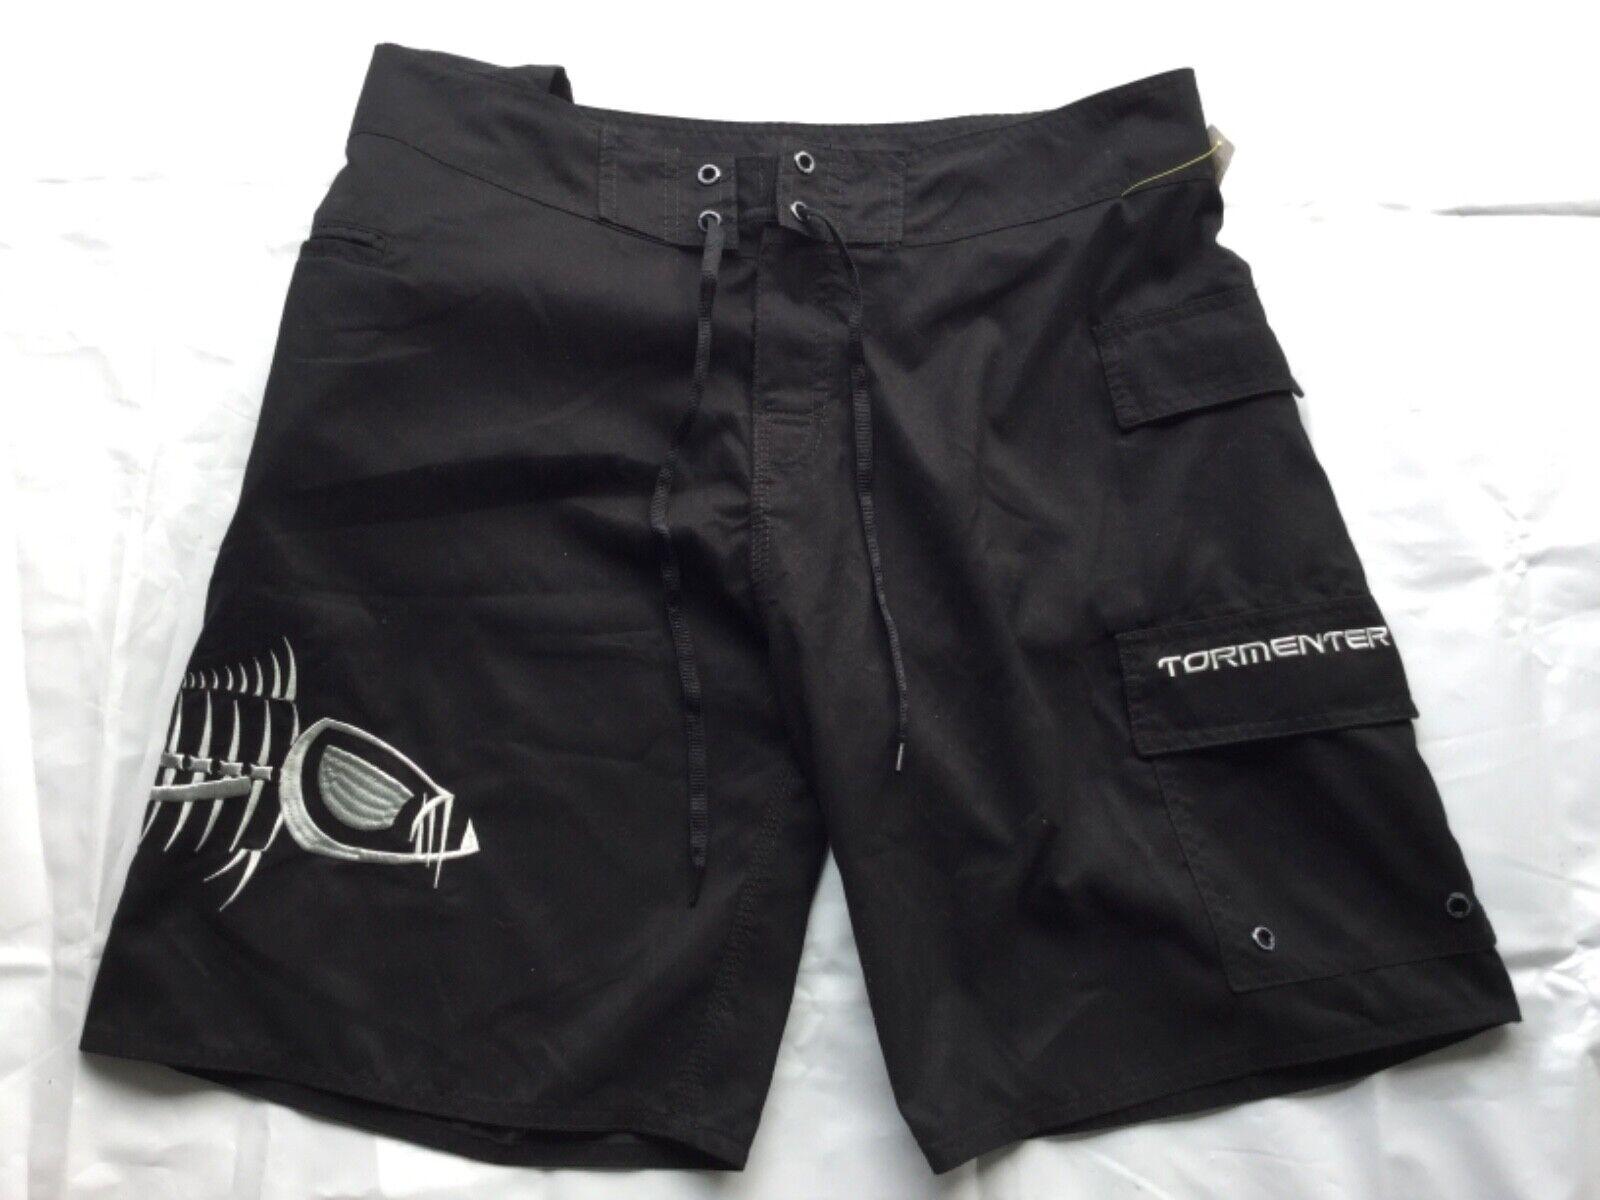 Tormenter Men's 5-Pocket Waterman Fishing Board Shorts Sz 36